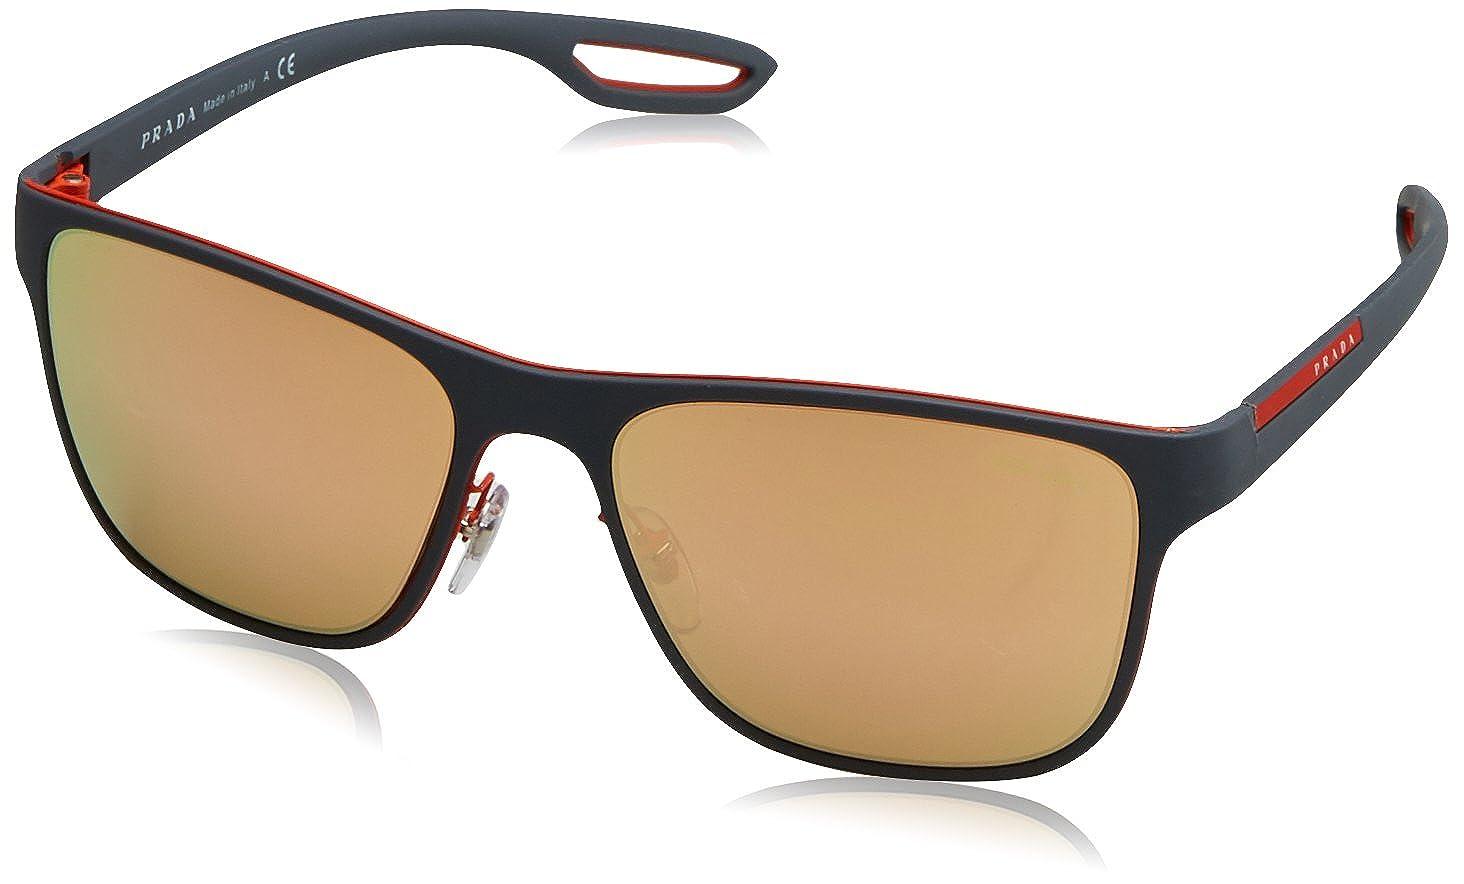 ee017d9bc19 Amazon.com  Prada Linea Rossa Men s PS 56QS Sunglasses 56mm  Clothing